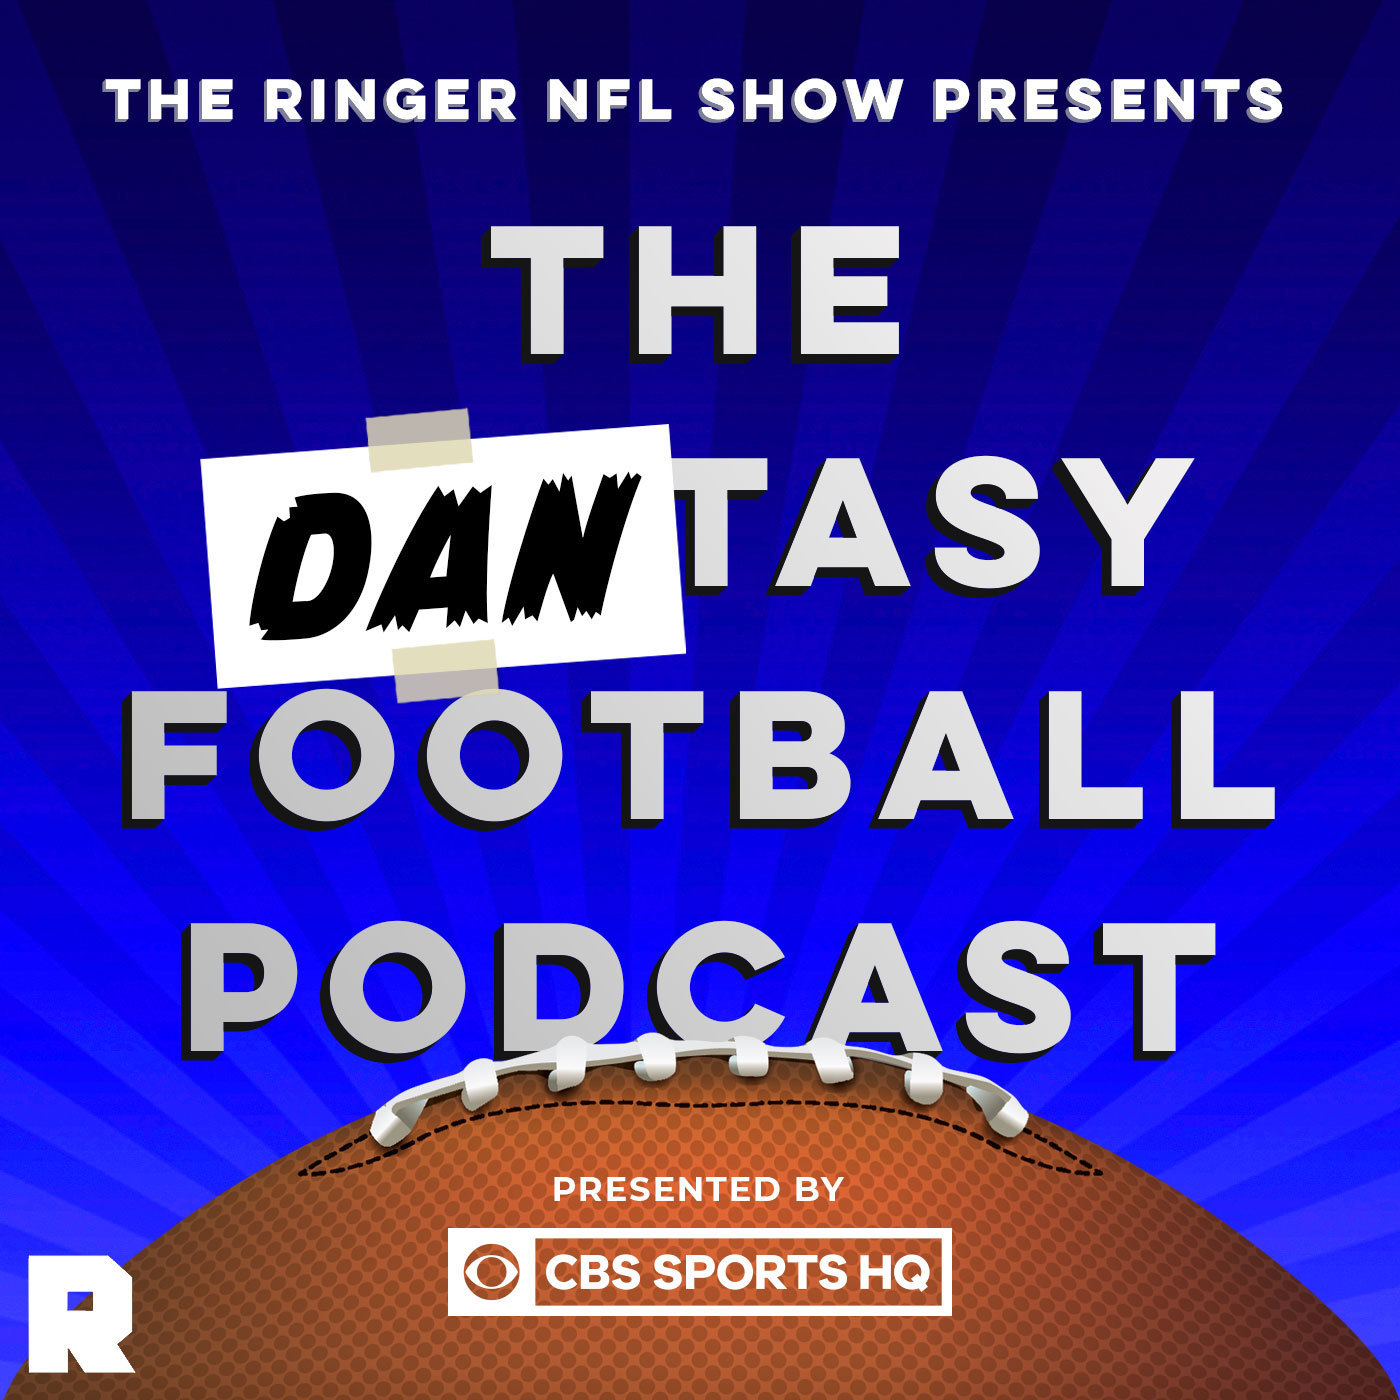 Key Week 1 Matchups and Our Daily Fantasy Lineup | The Dantasy Football Podcast